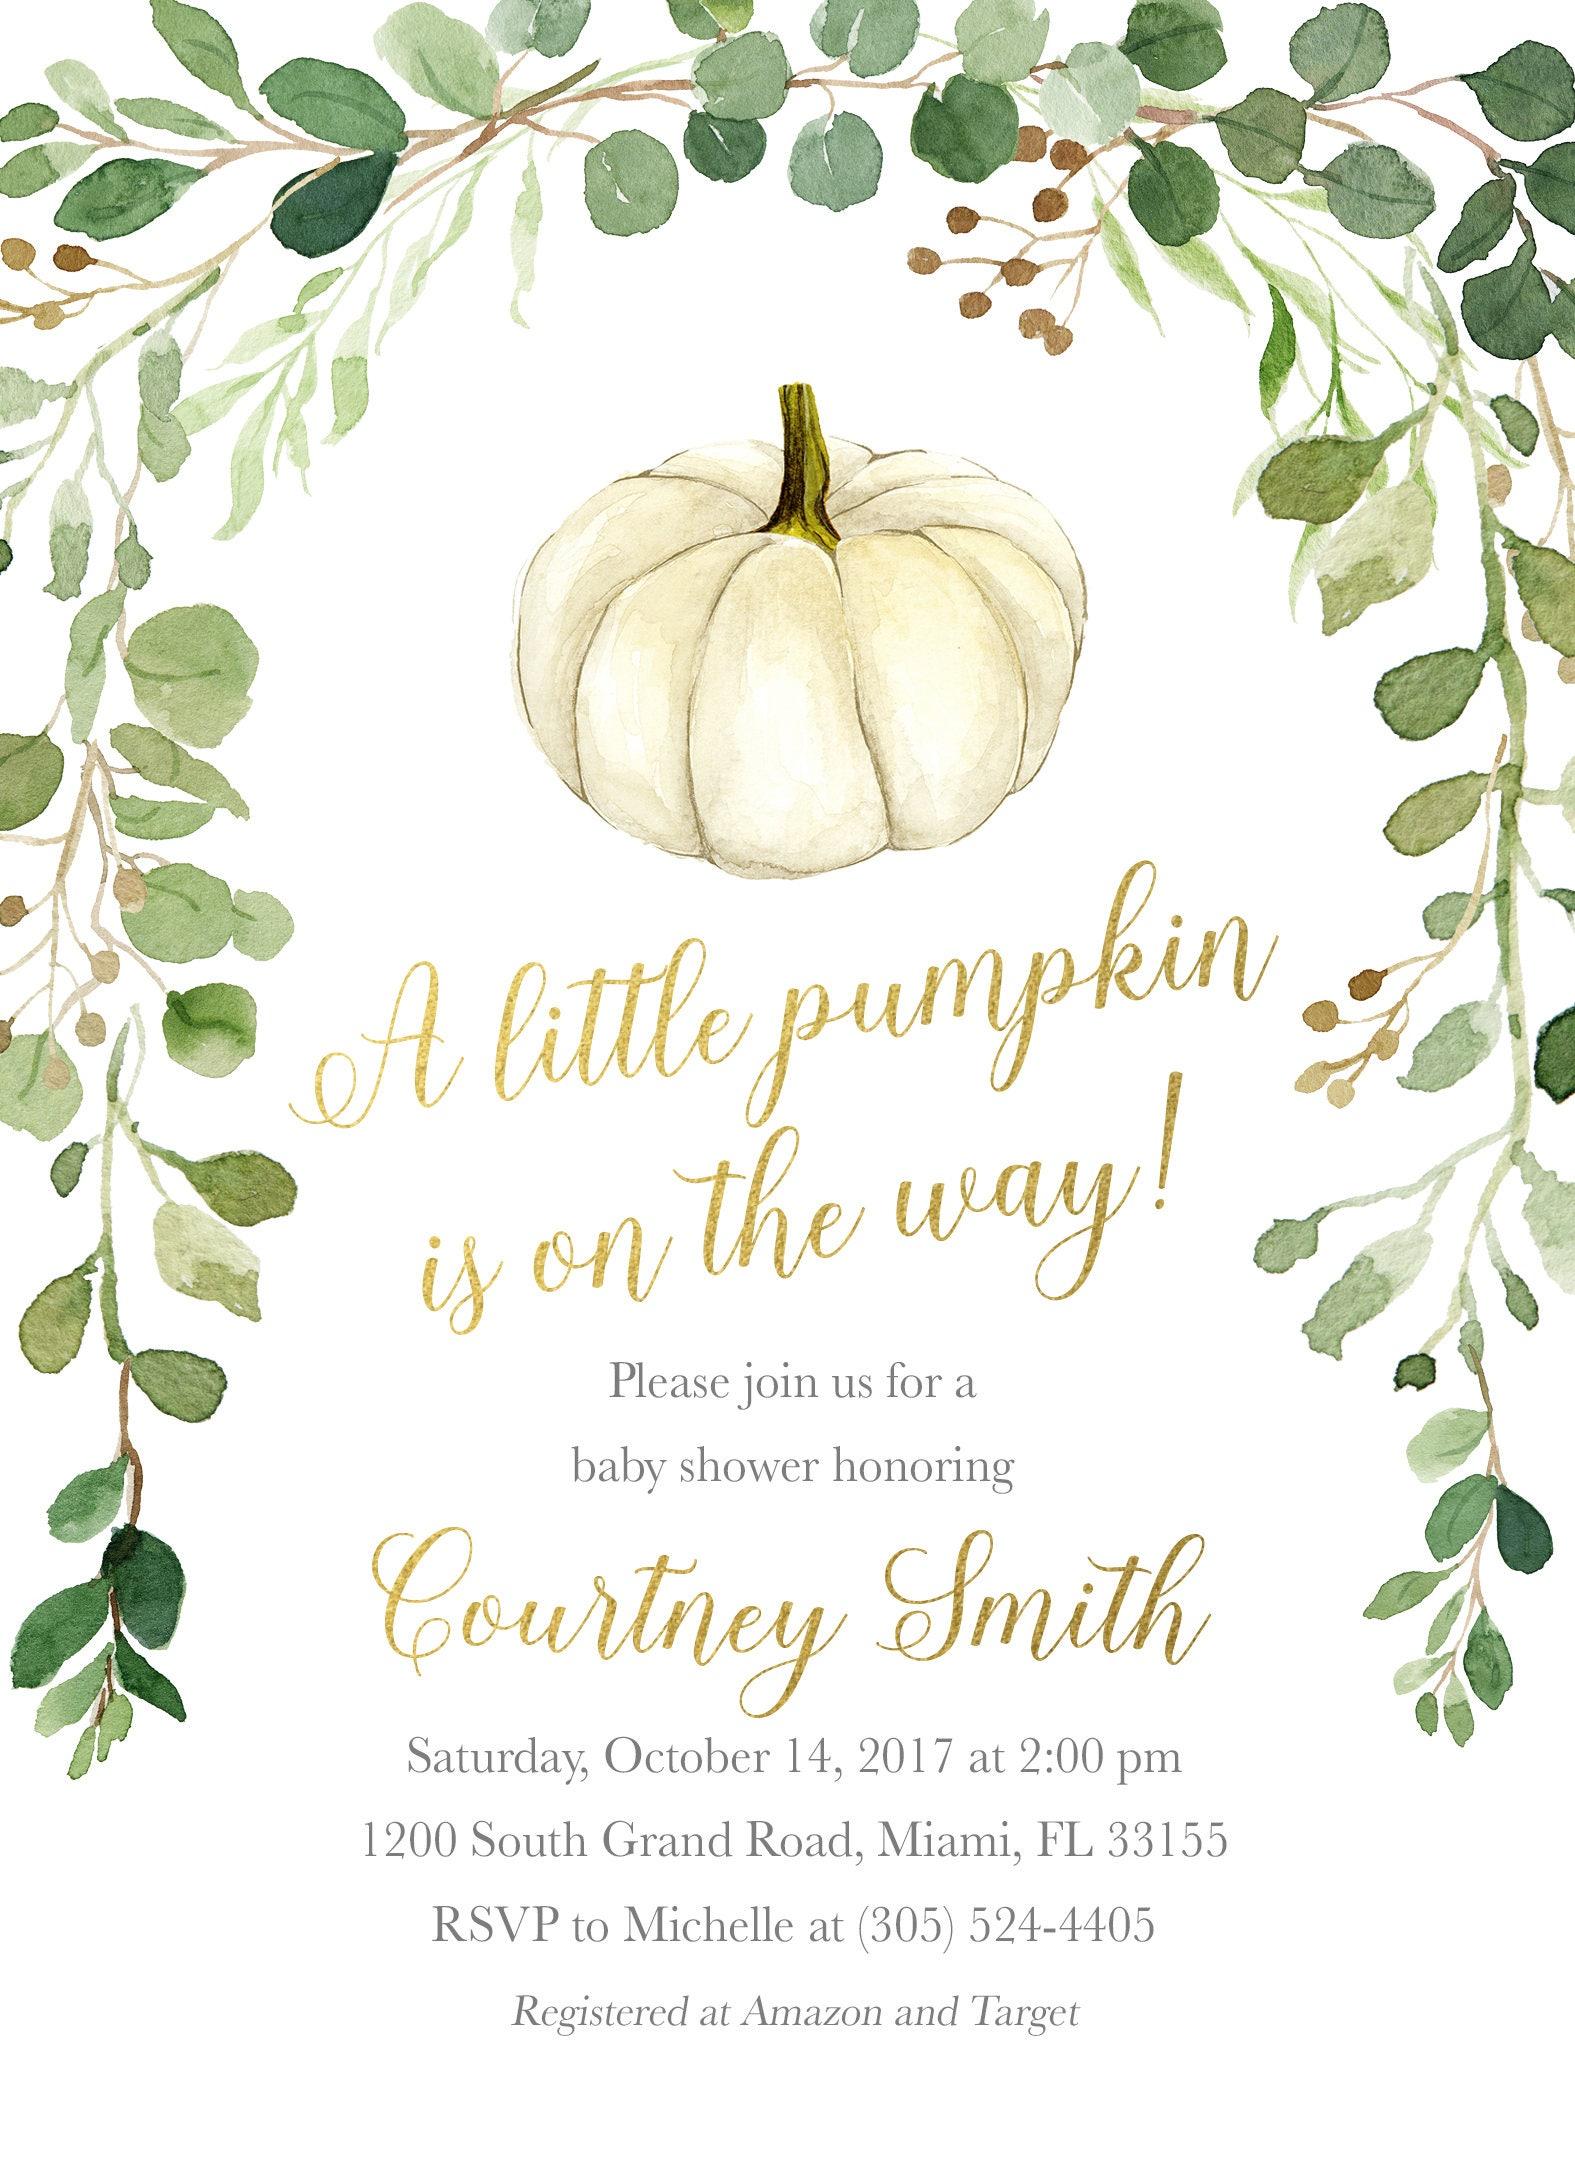 Pumpkin Baby Shower Invitation, Little Pumpkin on the Way ...